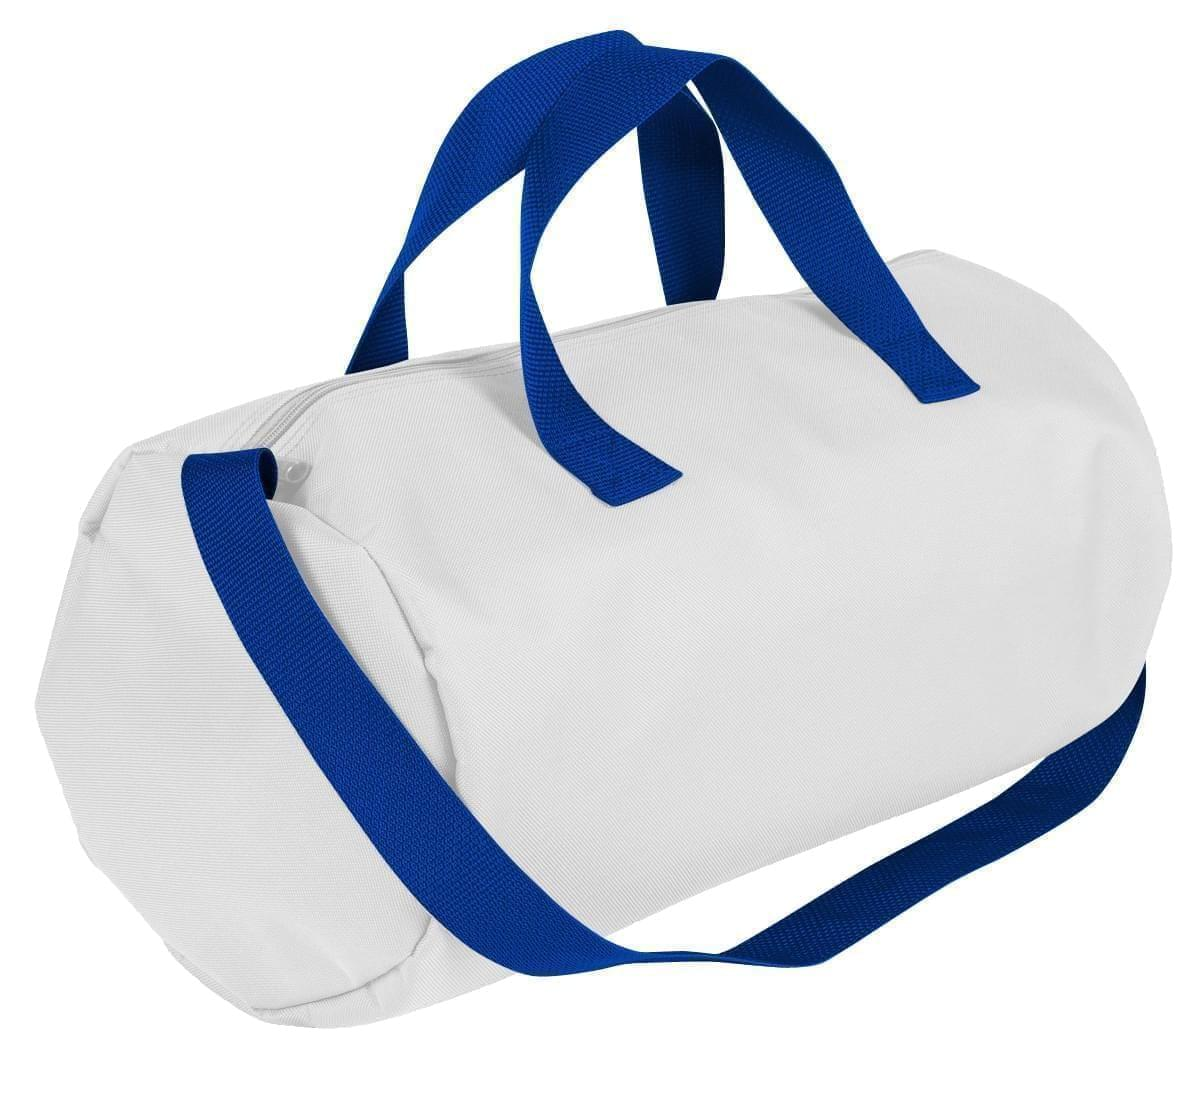 USA Made Nylon Poly Gym Roll Bags, White-Royal Blue, ROCX31AA33